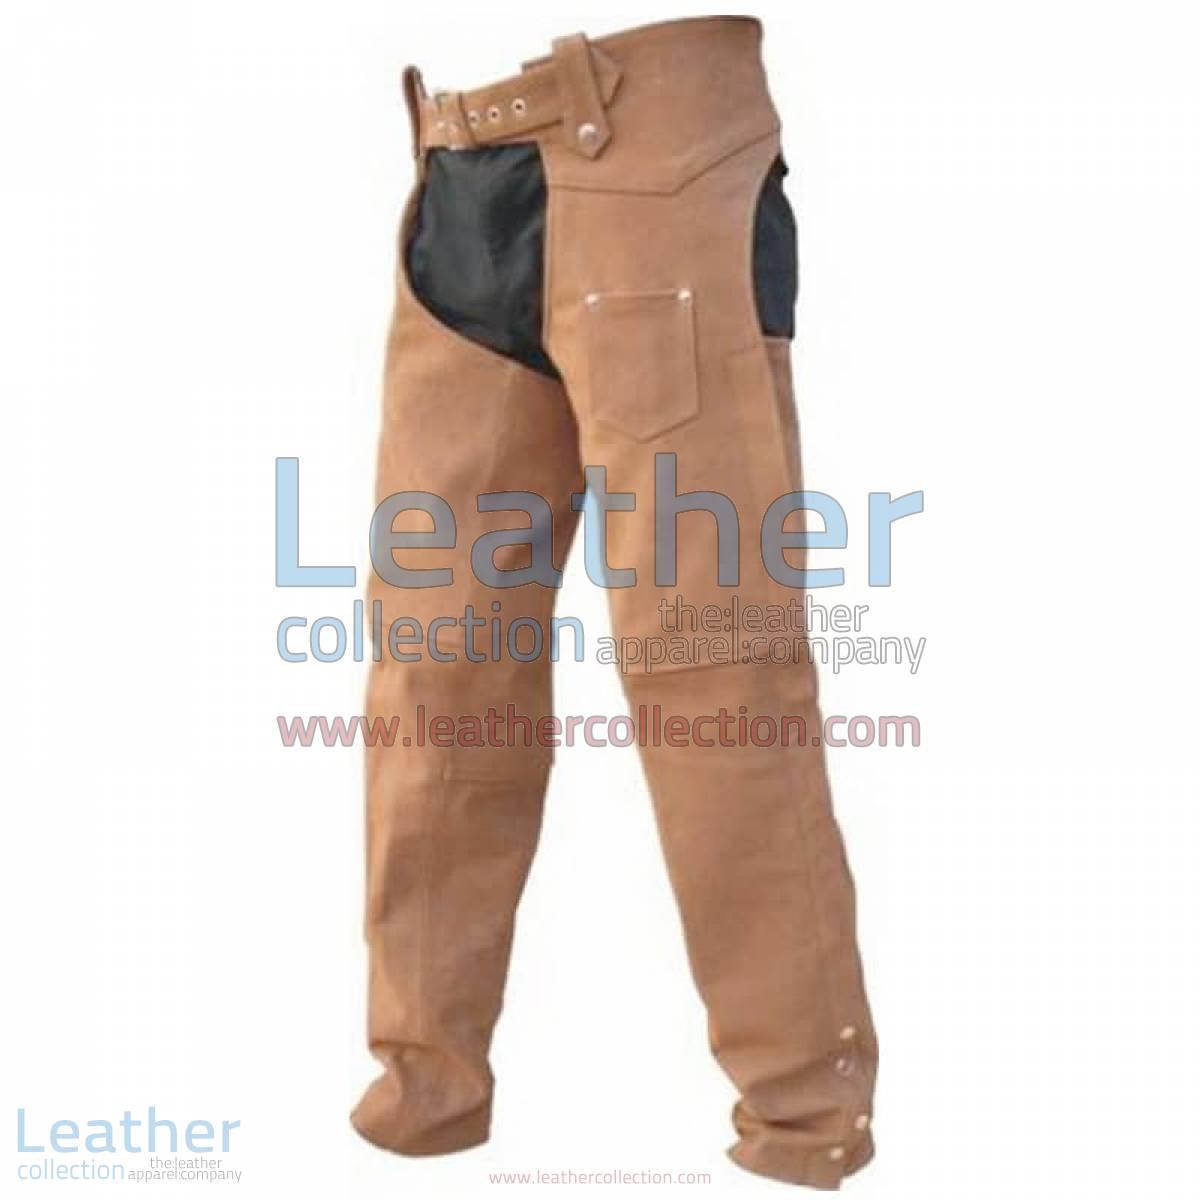 Men's leather Riding Chaps